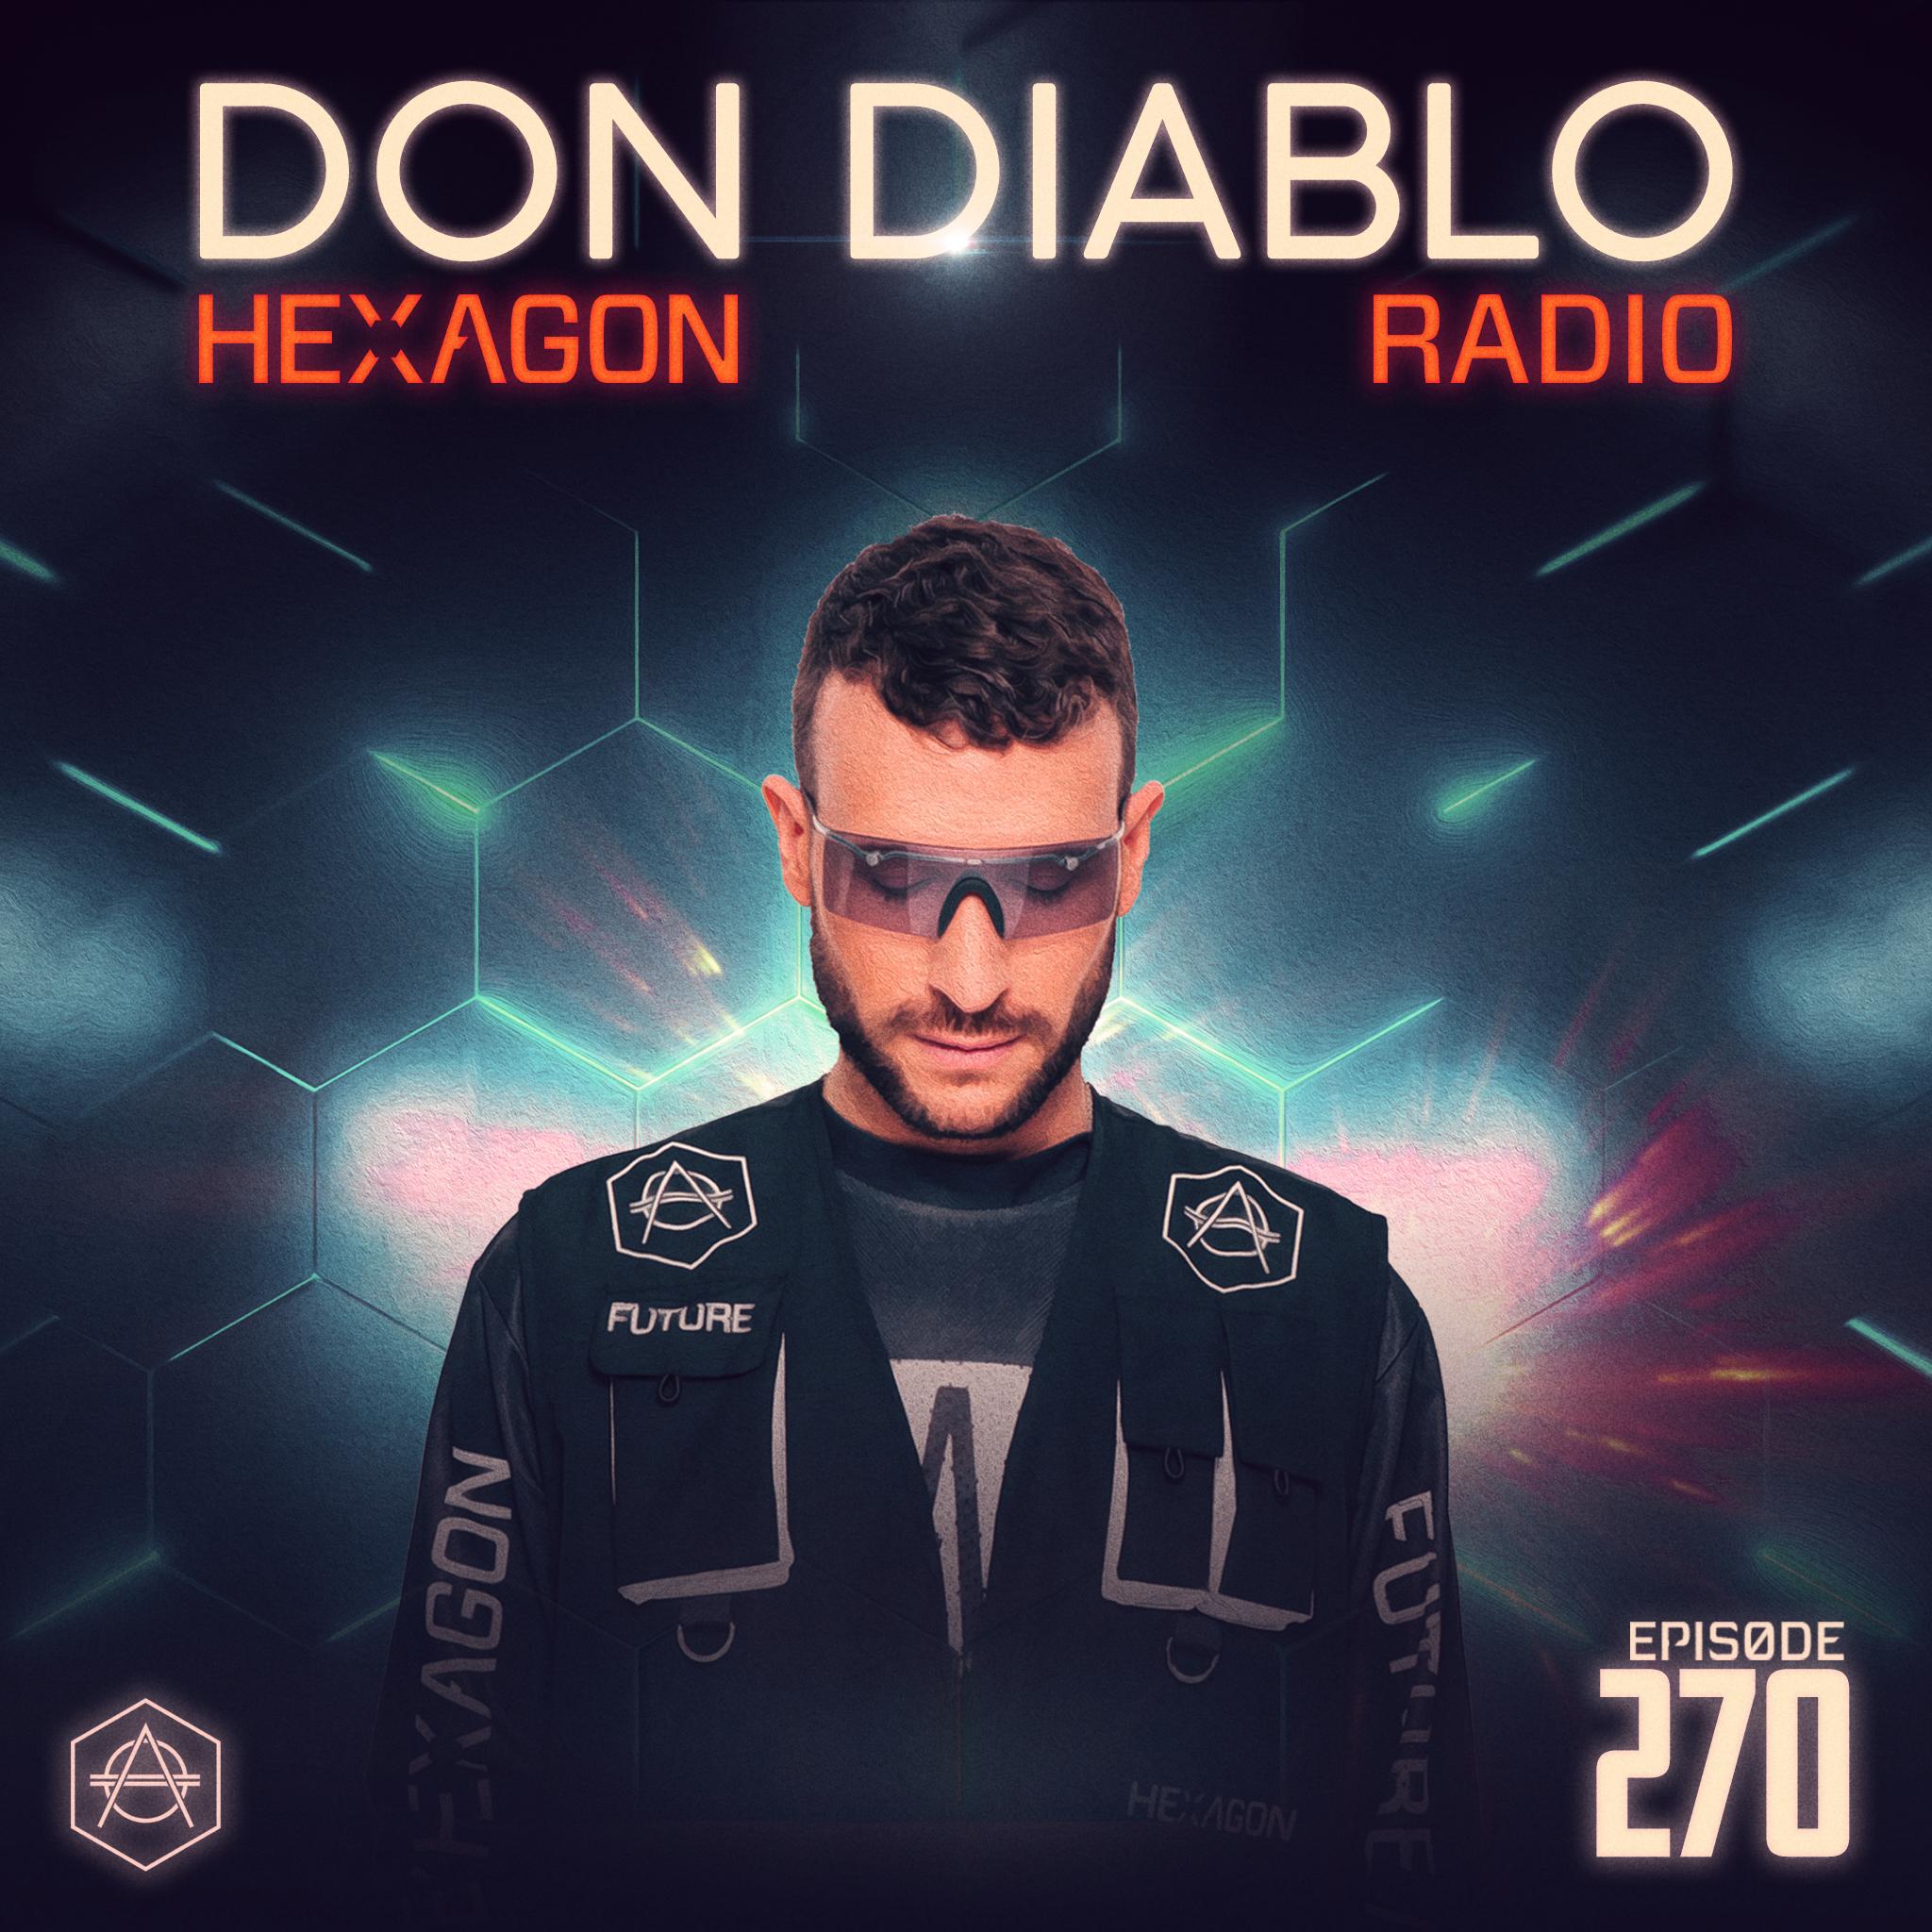 Don Diablo Hexagon Radio Episode 270